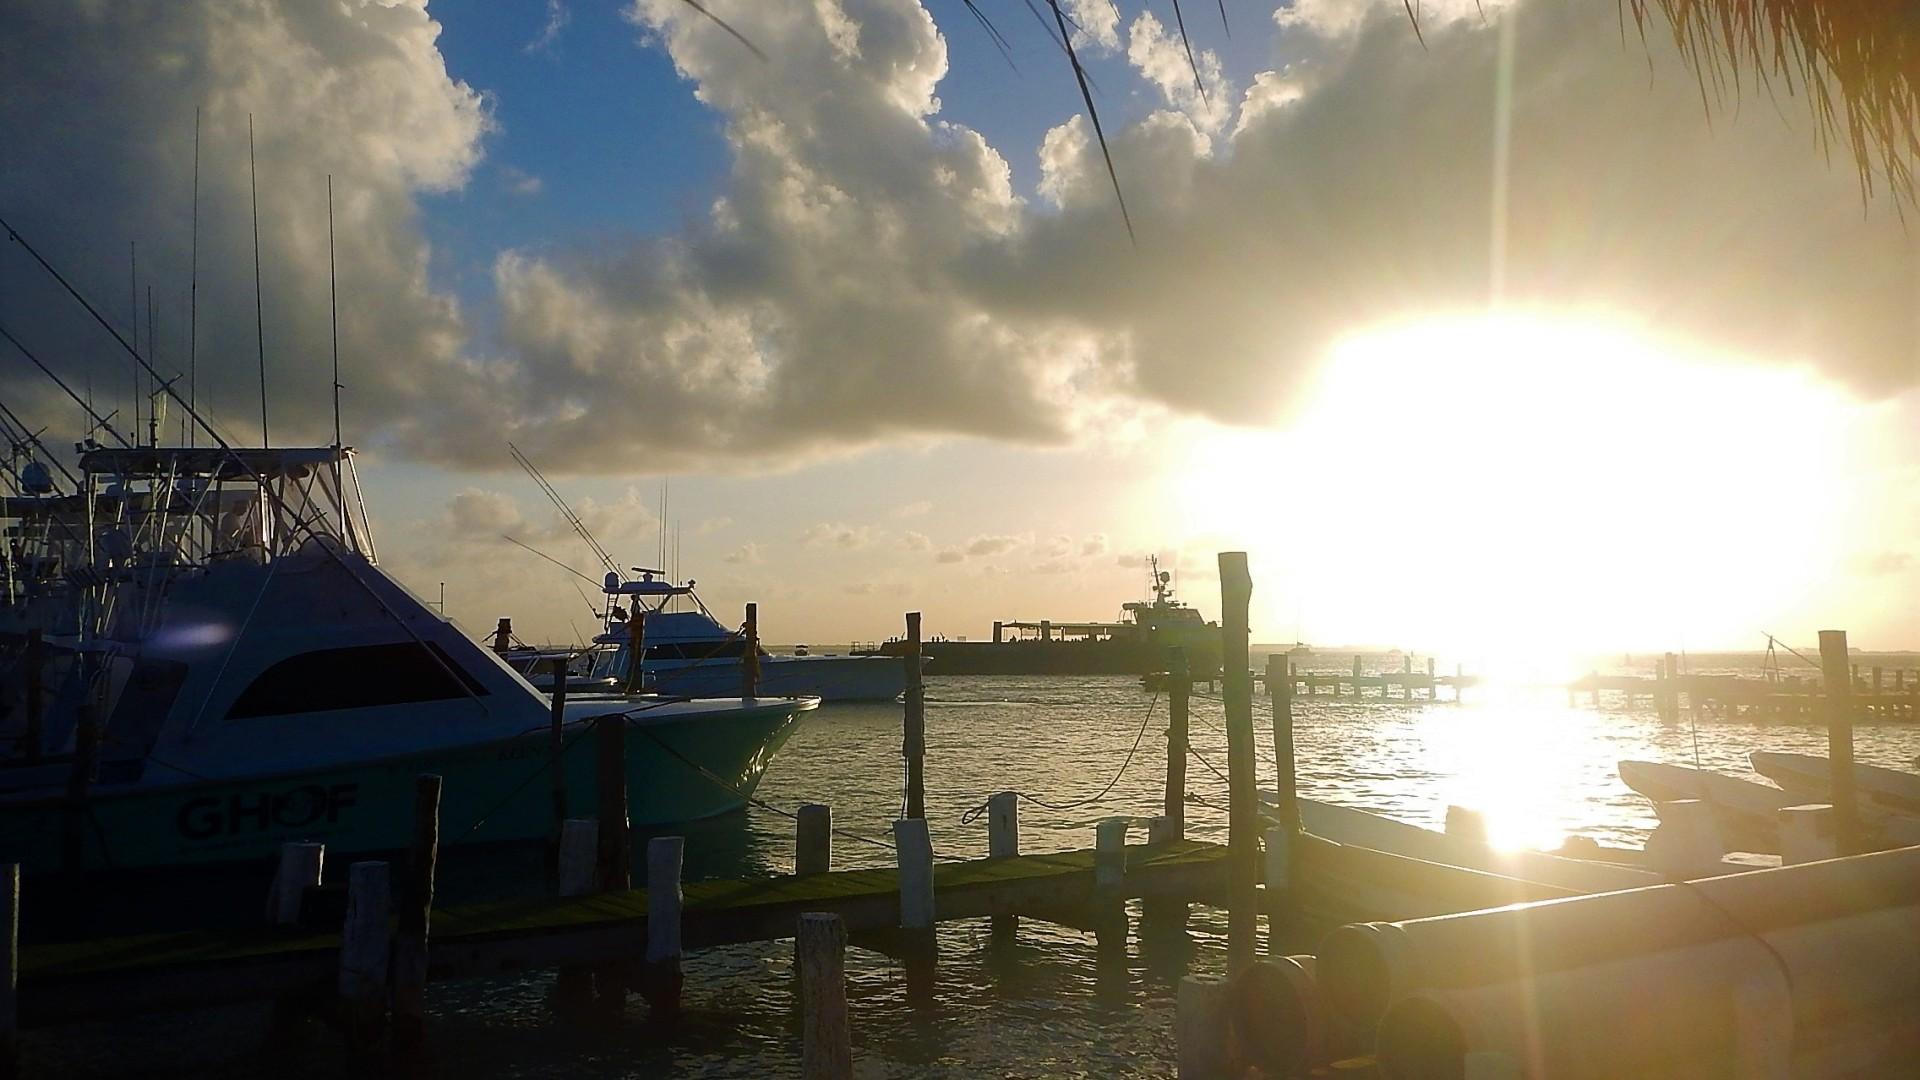 yachts at the docks on Isla Mujeres